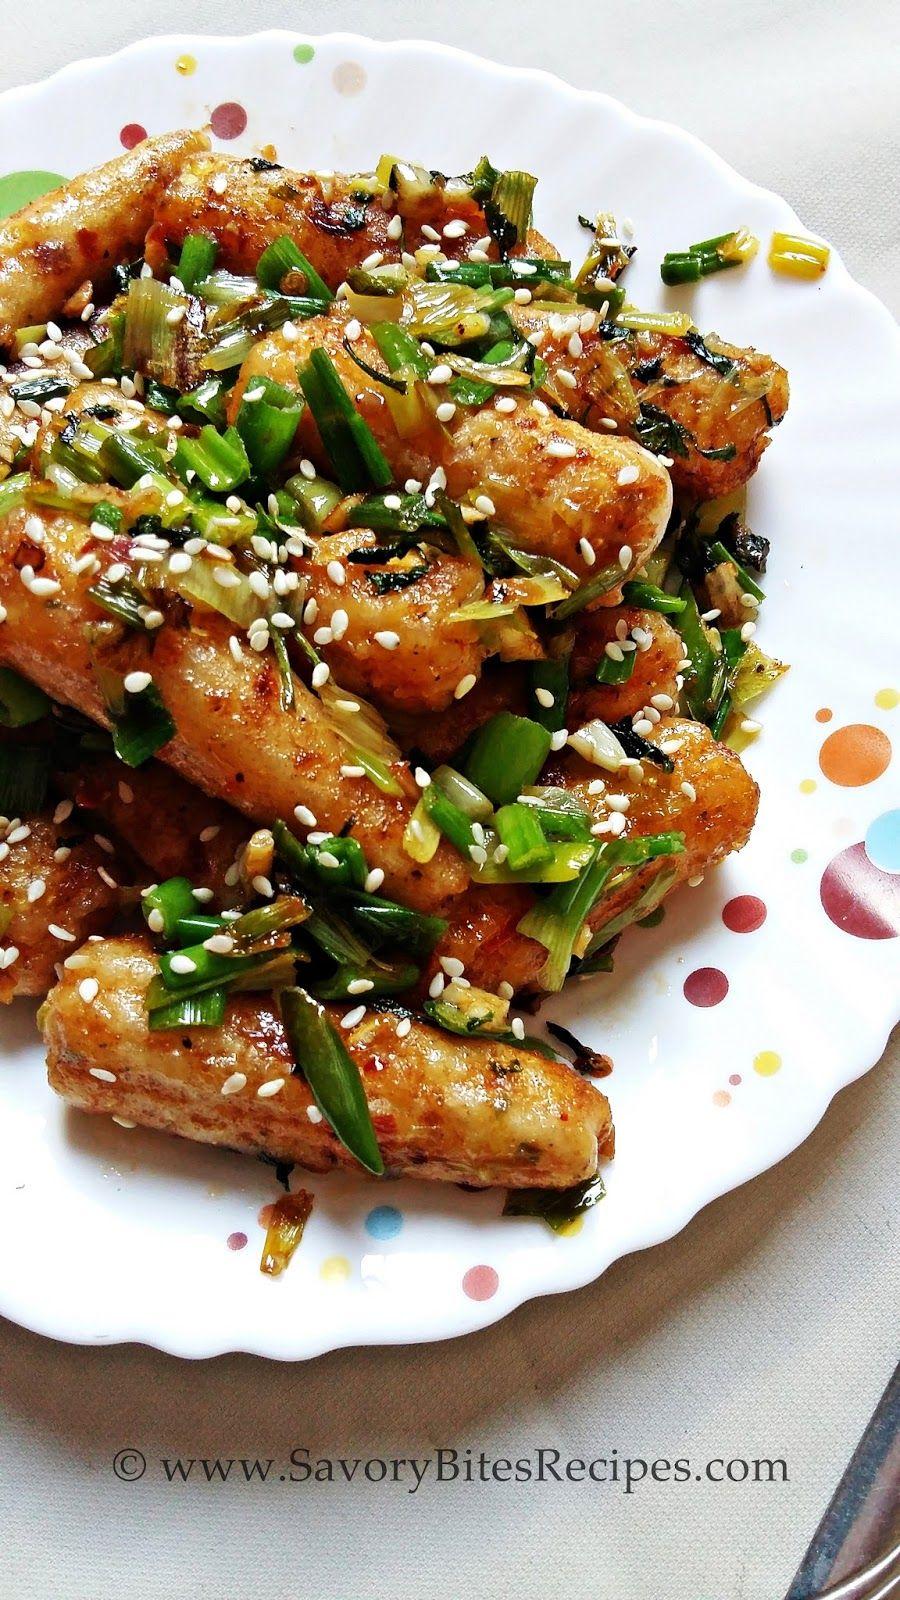 Baby corn crispy chili tossed recipe starters babies and snacks baby corn crispy chili tossed forumfinder Images